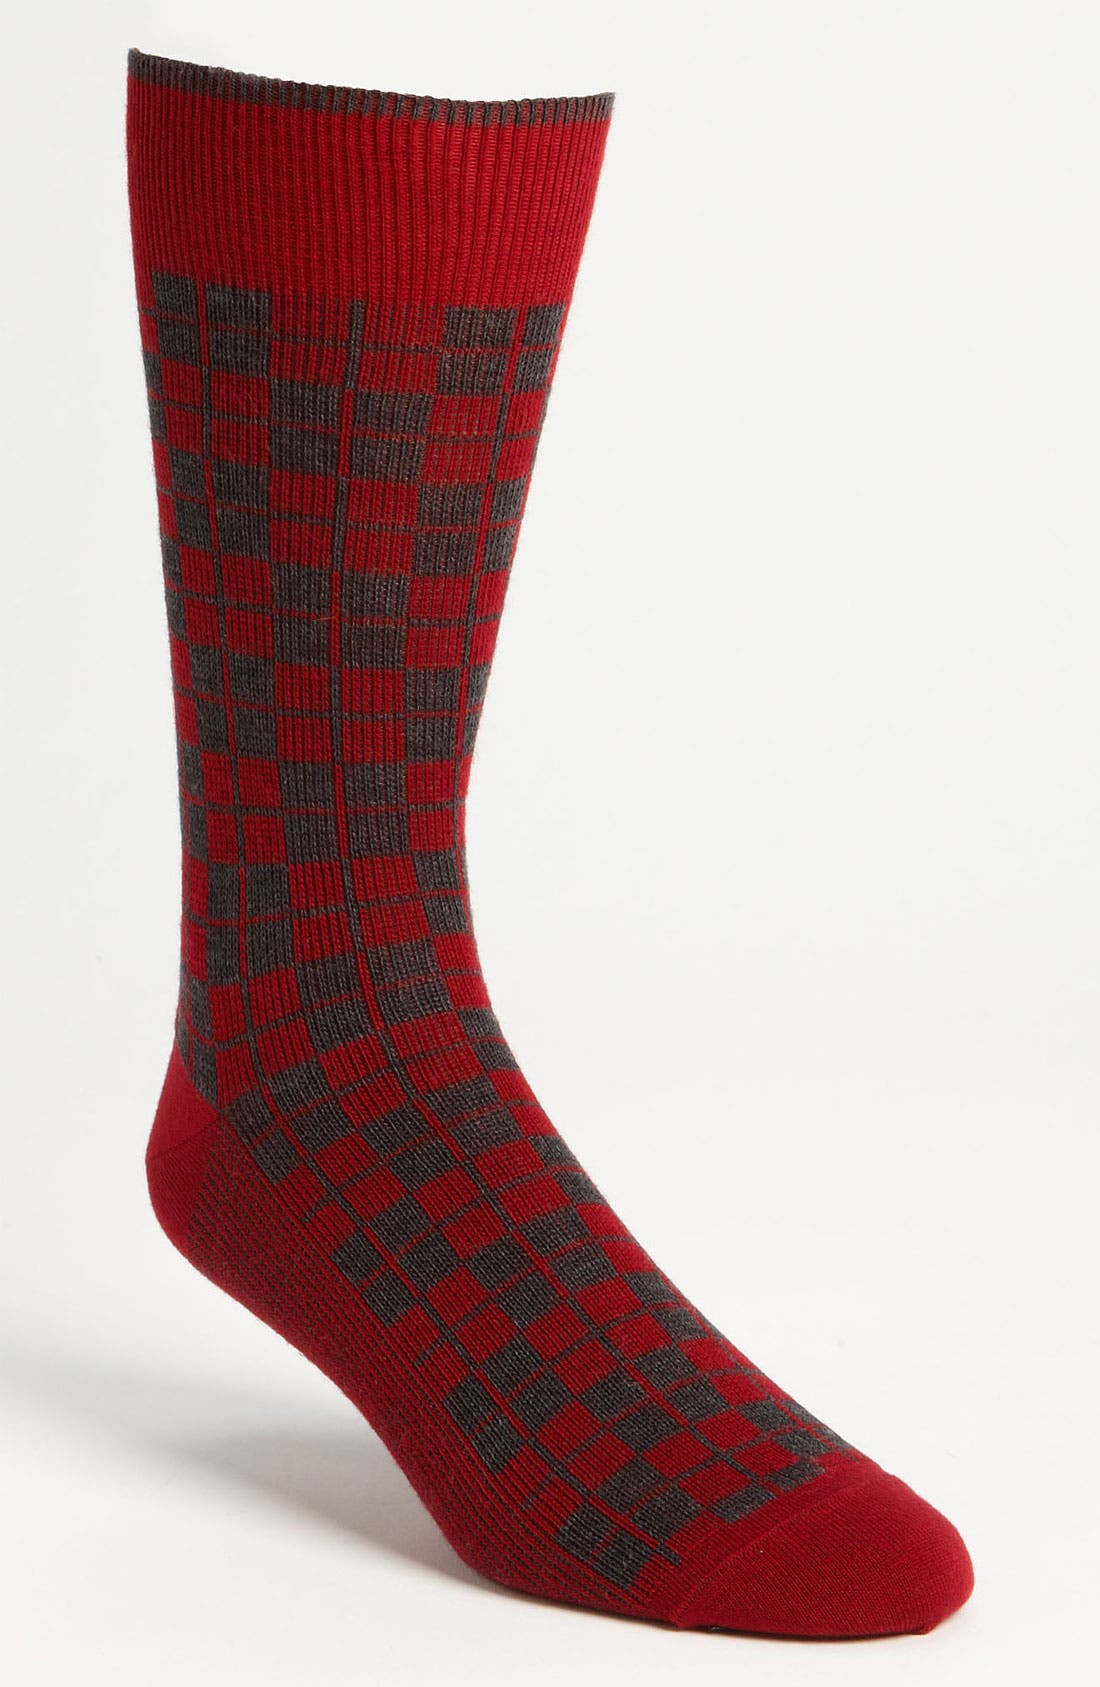 Alternate Image 1 Selected - Marcoliani 'Jacquard' Tartan Socks